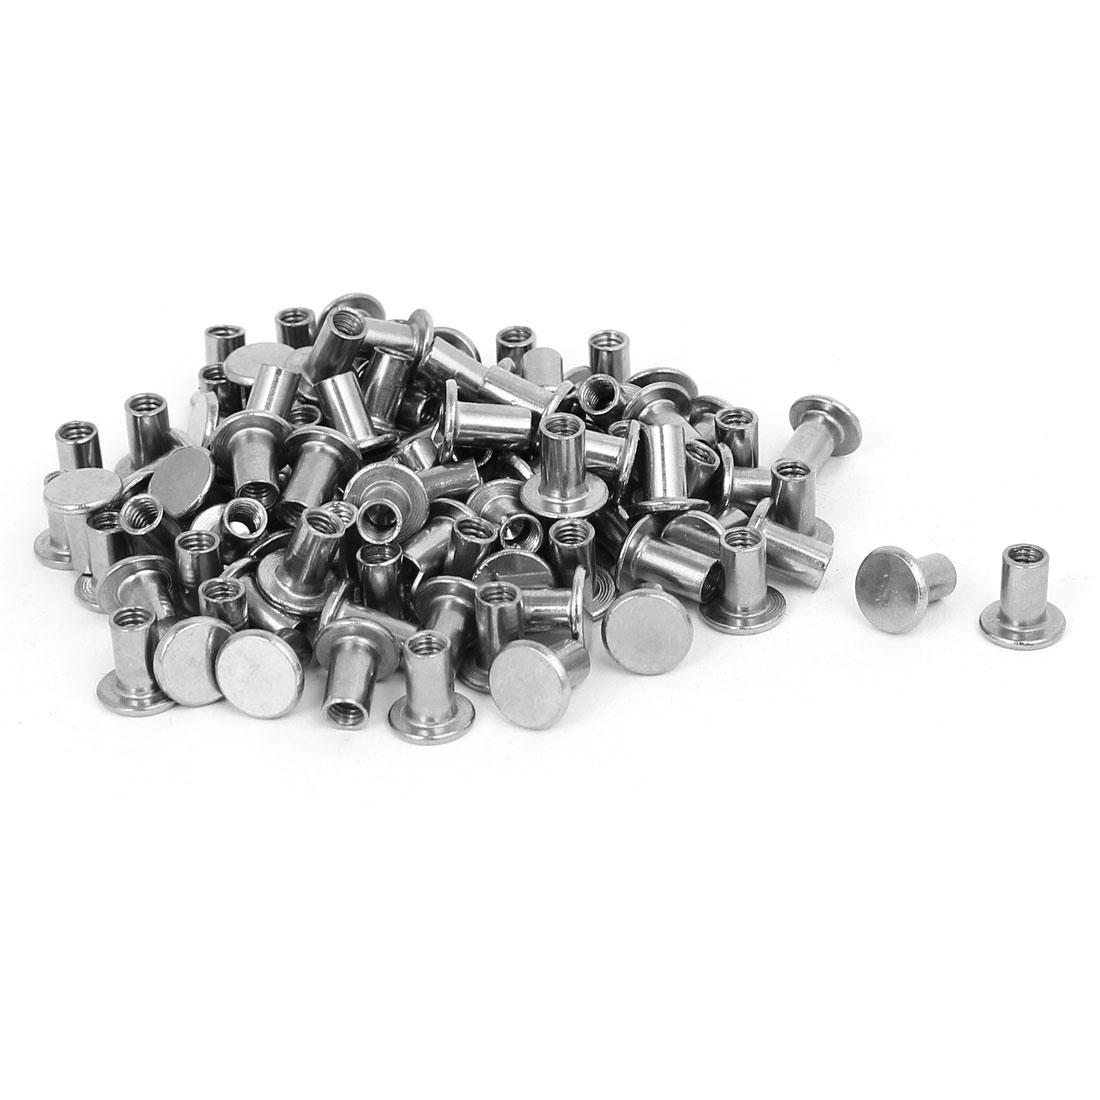 Photo Album Metal Nickel Plated Binding Screw Post Barrel Nut 5mmx8mm 100pcs